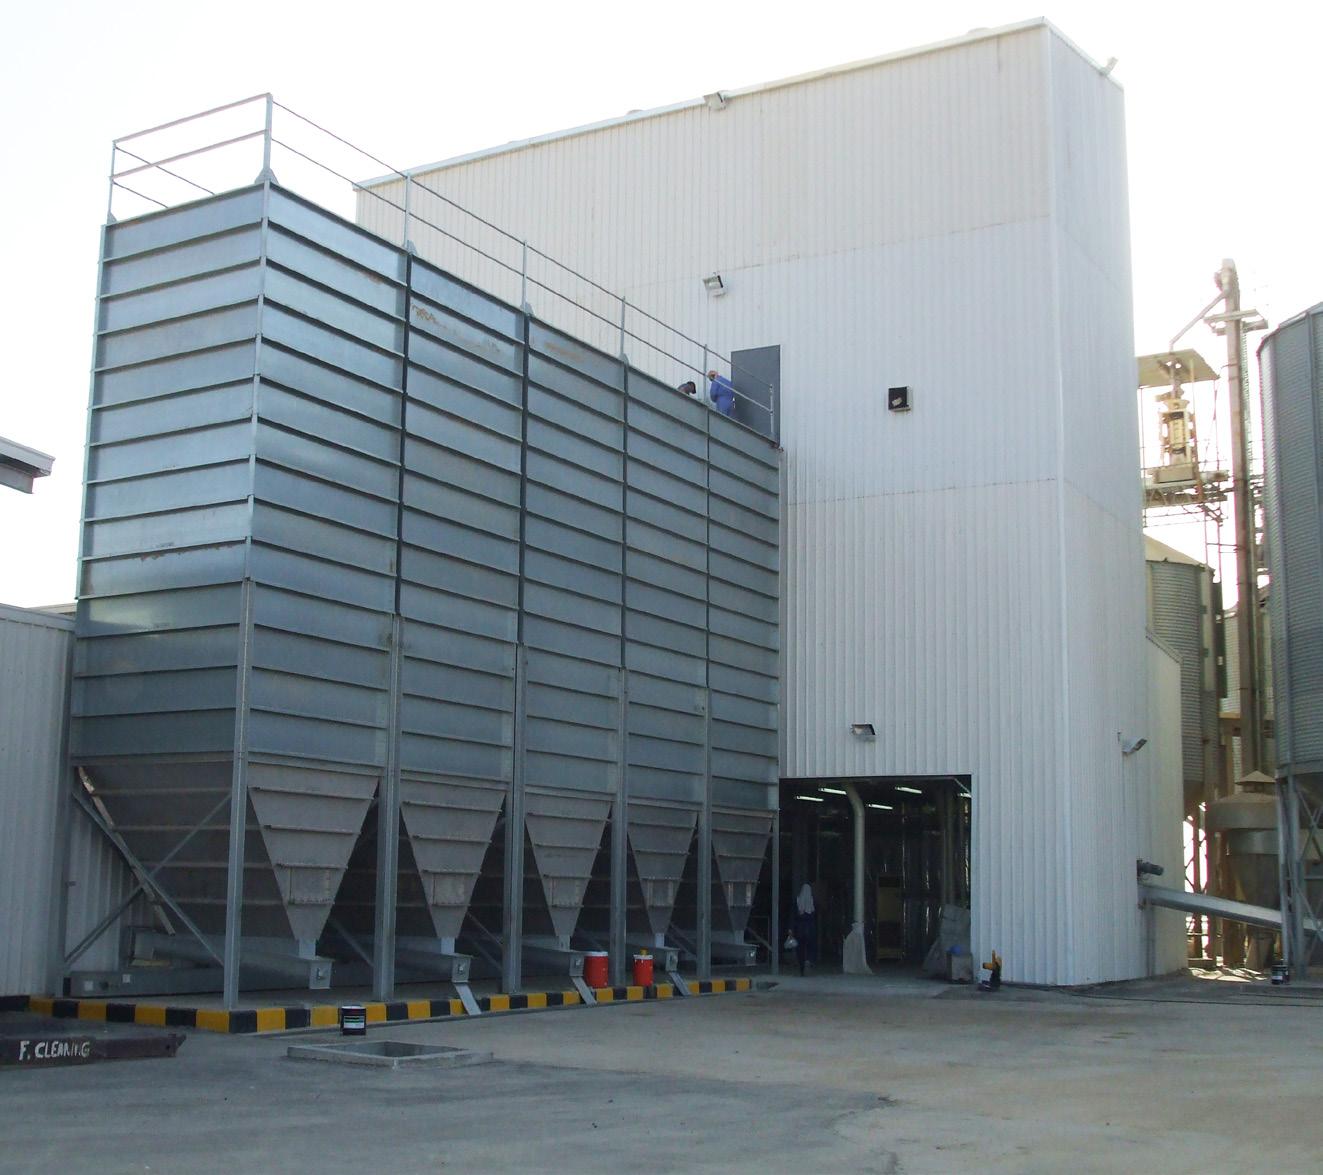 Alvan Blanch Steam Flaking Factory Al Safi Saudi Arabia Page 4 Image 0001